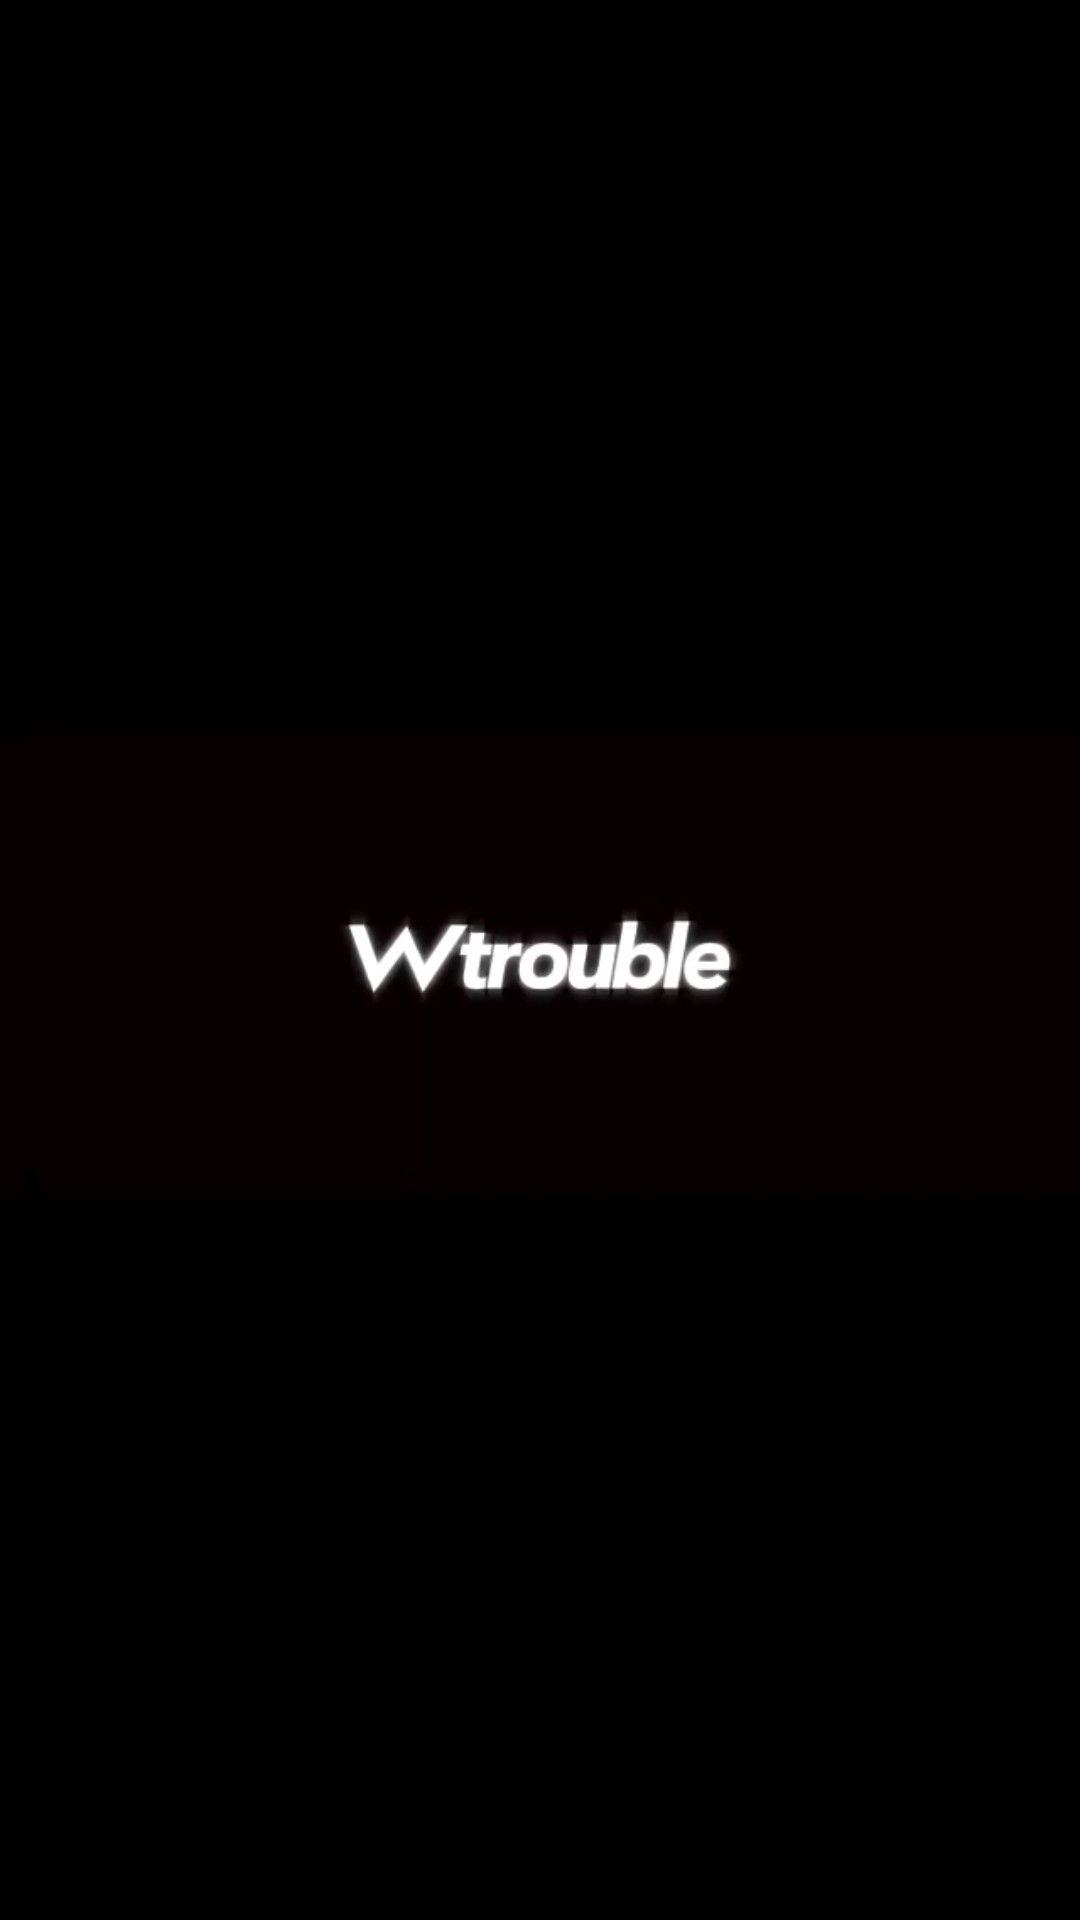 Wtrouble ジャニーズ west ジャニーズWEST/W trouble